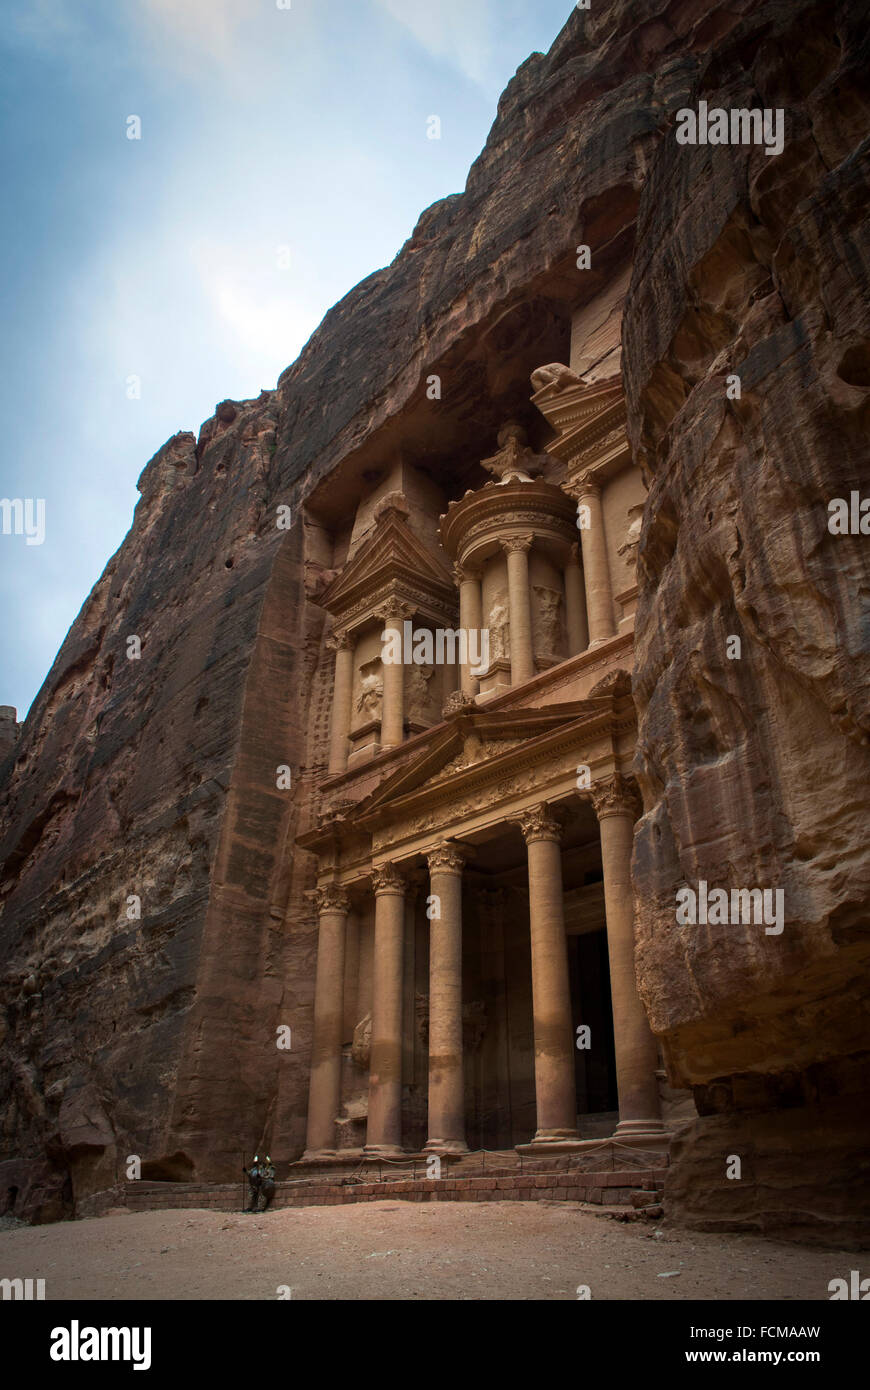 Das Finanzministerium in Petra, Jordanien Stockbild